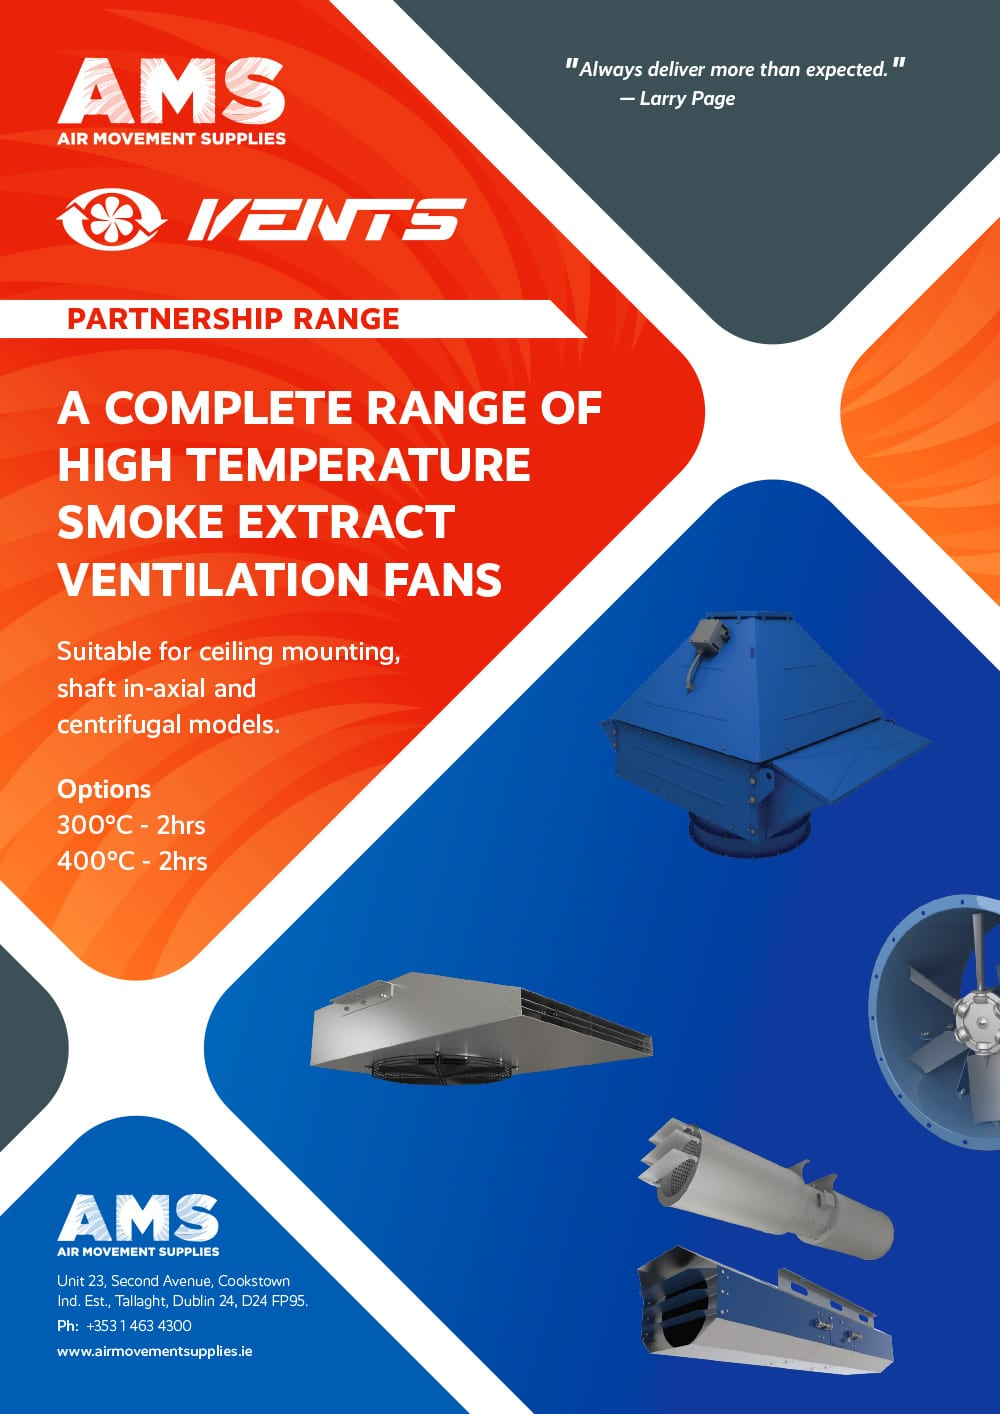 AMS Vents Partnership Range Smoke Extract Commercial